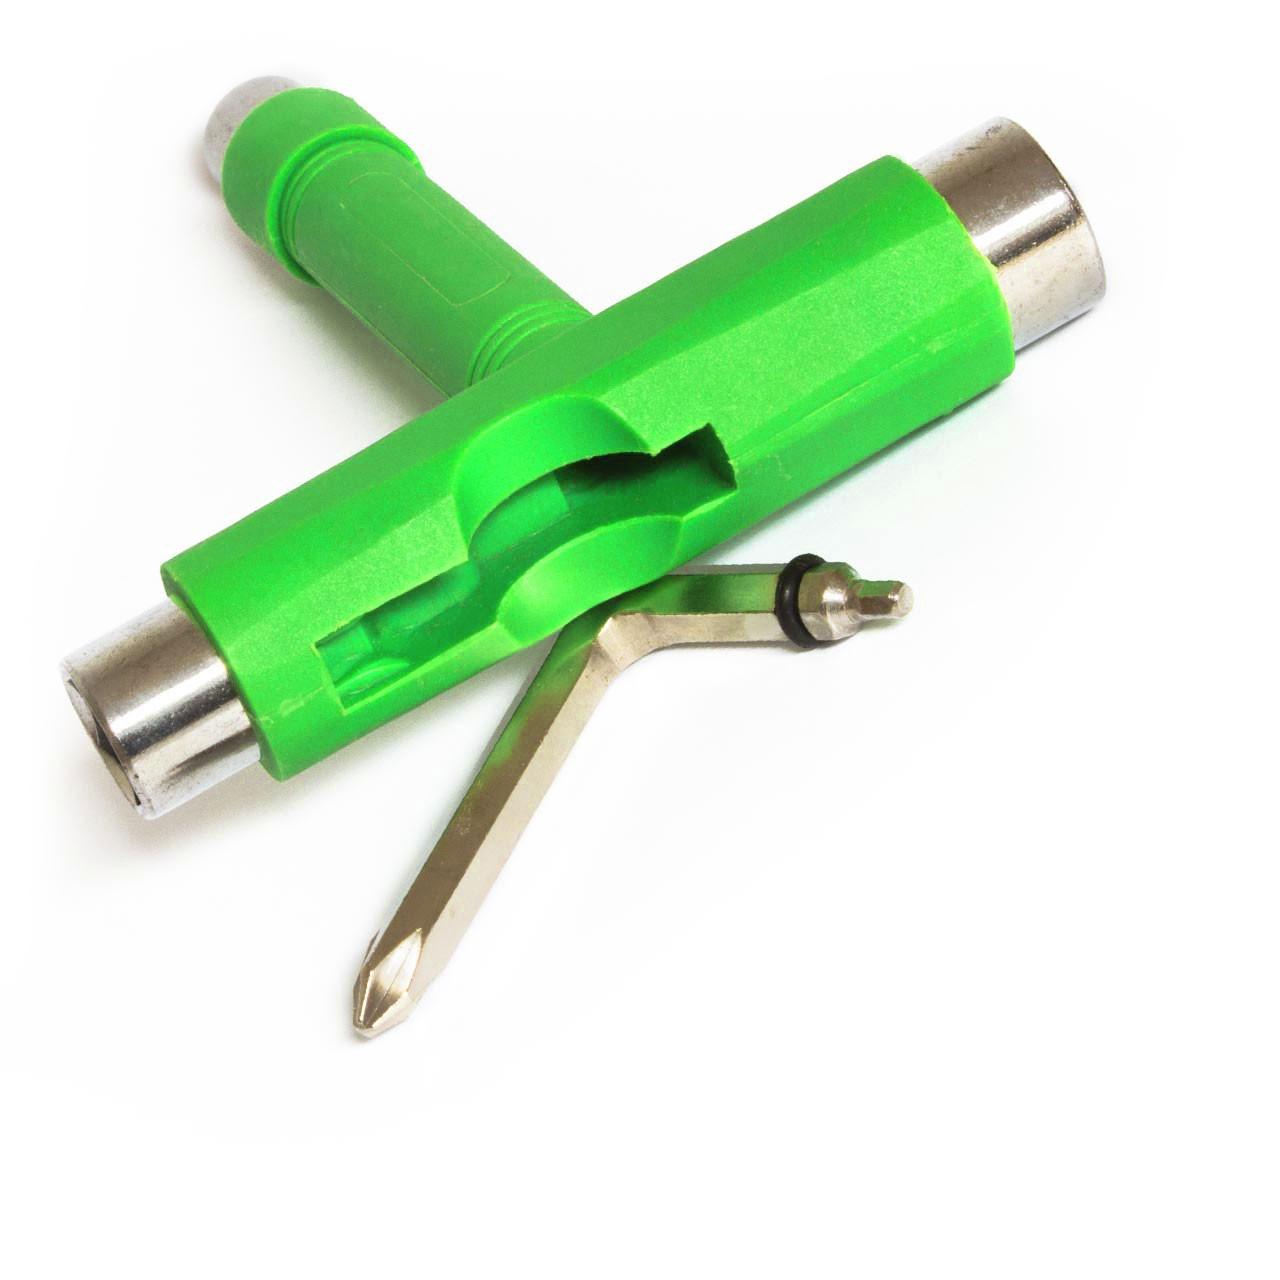 Skateboard Werkzeug  T-Tool , Skate Tool grün